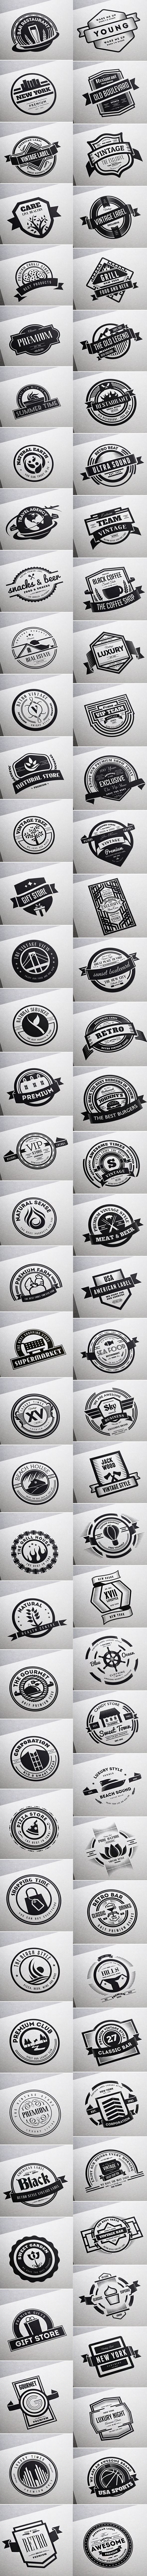 80 Vintage Labels & Badges Logos - Premium Bundle on Behance